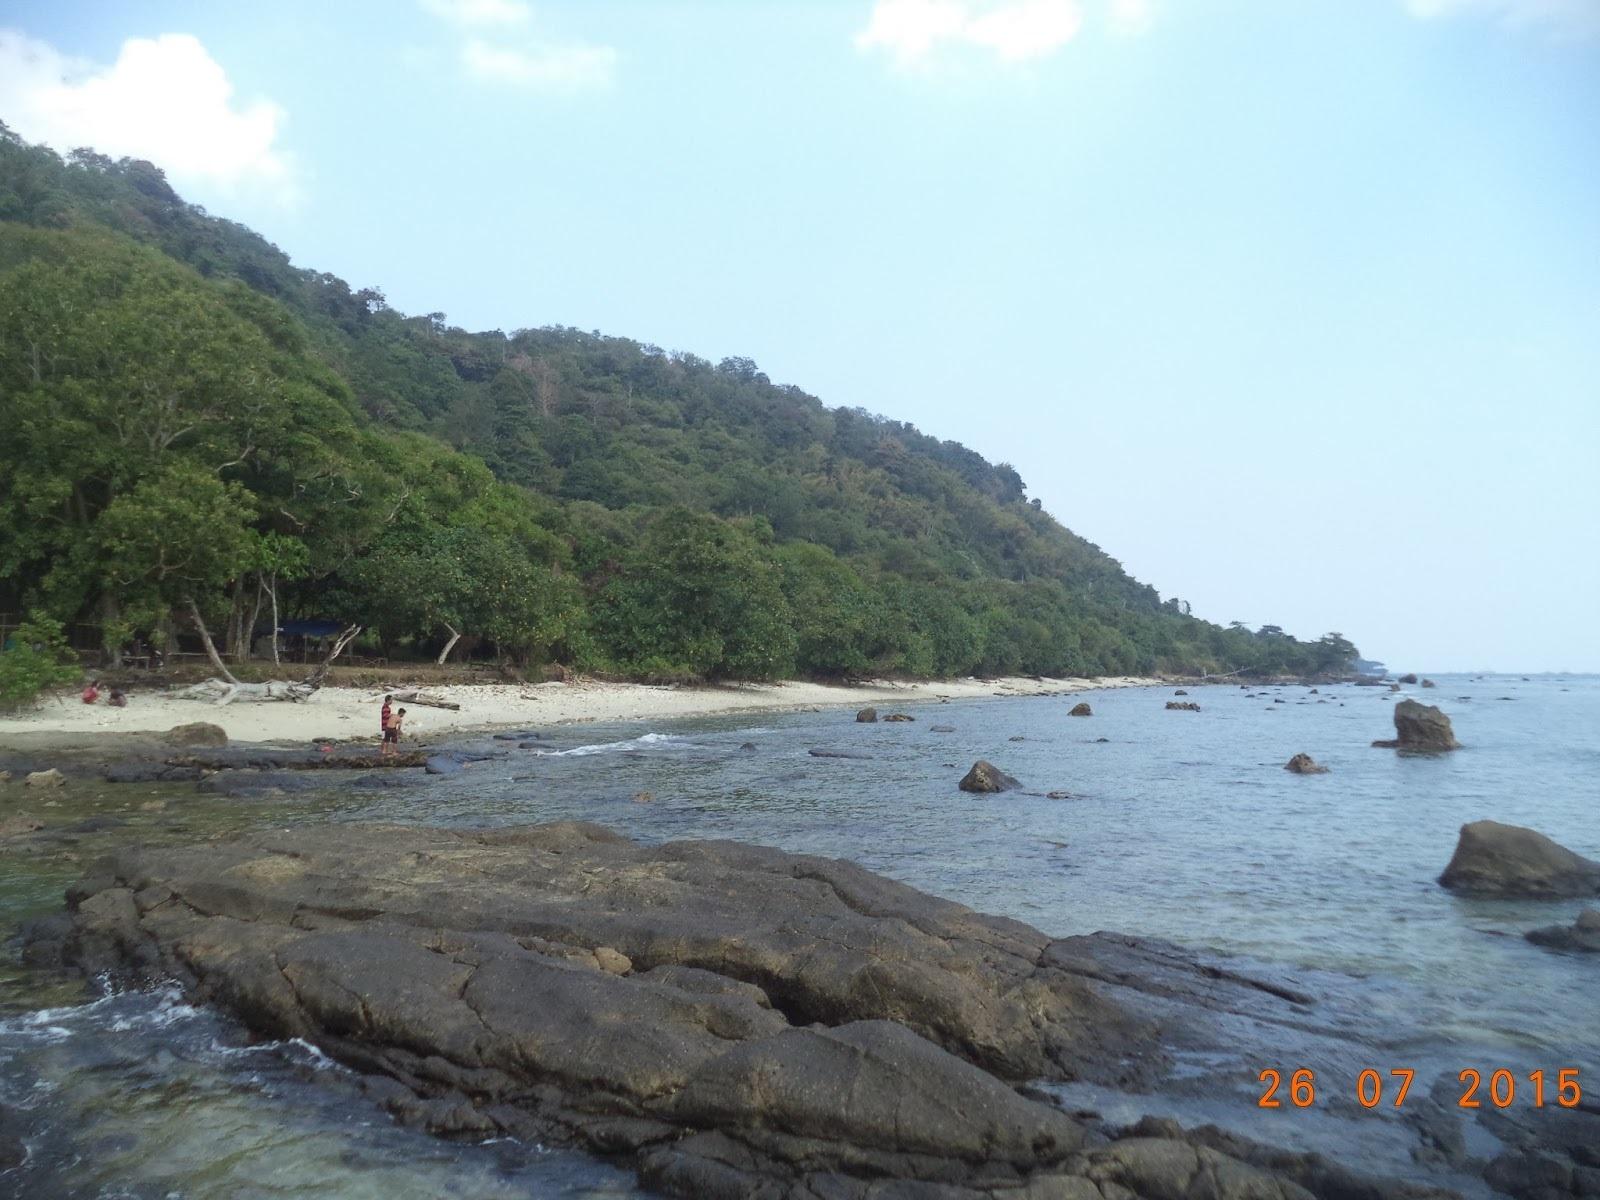 Batu Hideung Beach